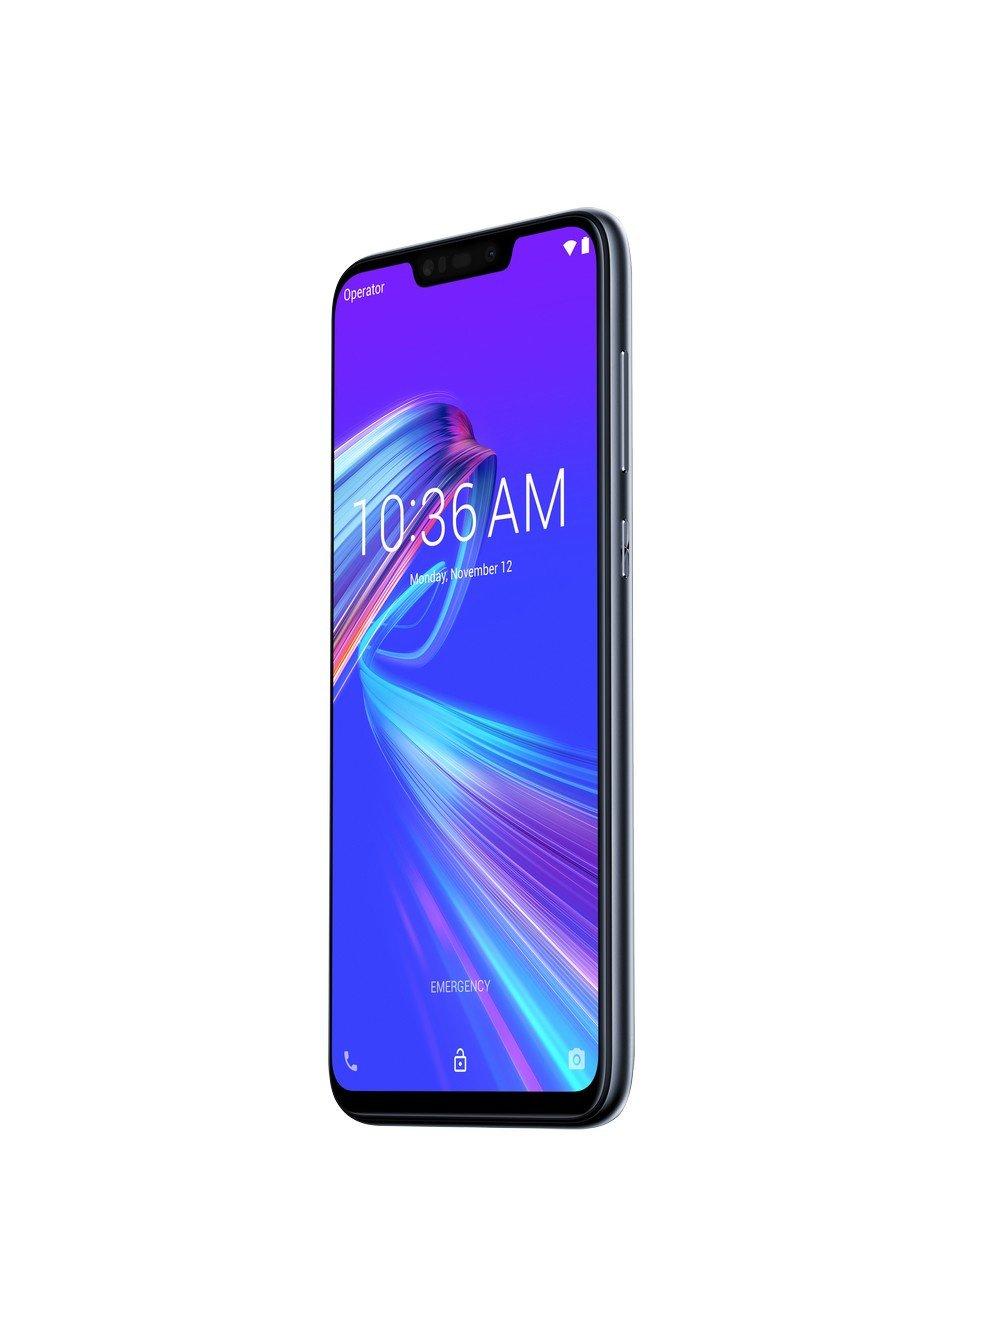 Смартфон Asus ZenFone Max (M2) (ZB633KL-4A070EU) 4/32 GB DUALSIM Black с чехлом фото 6